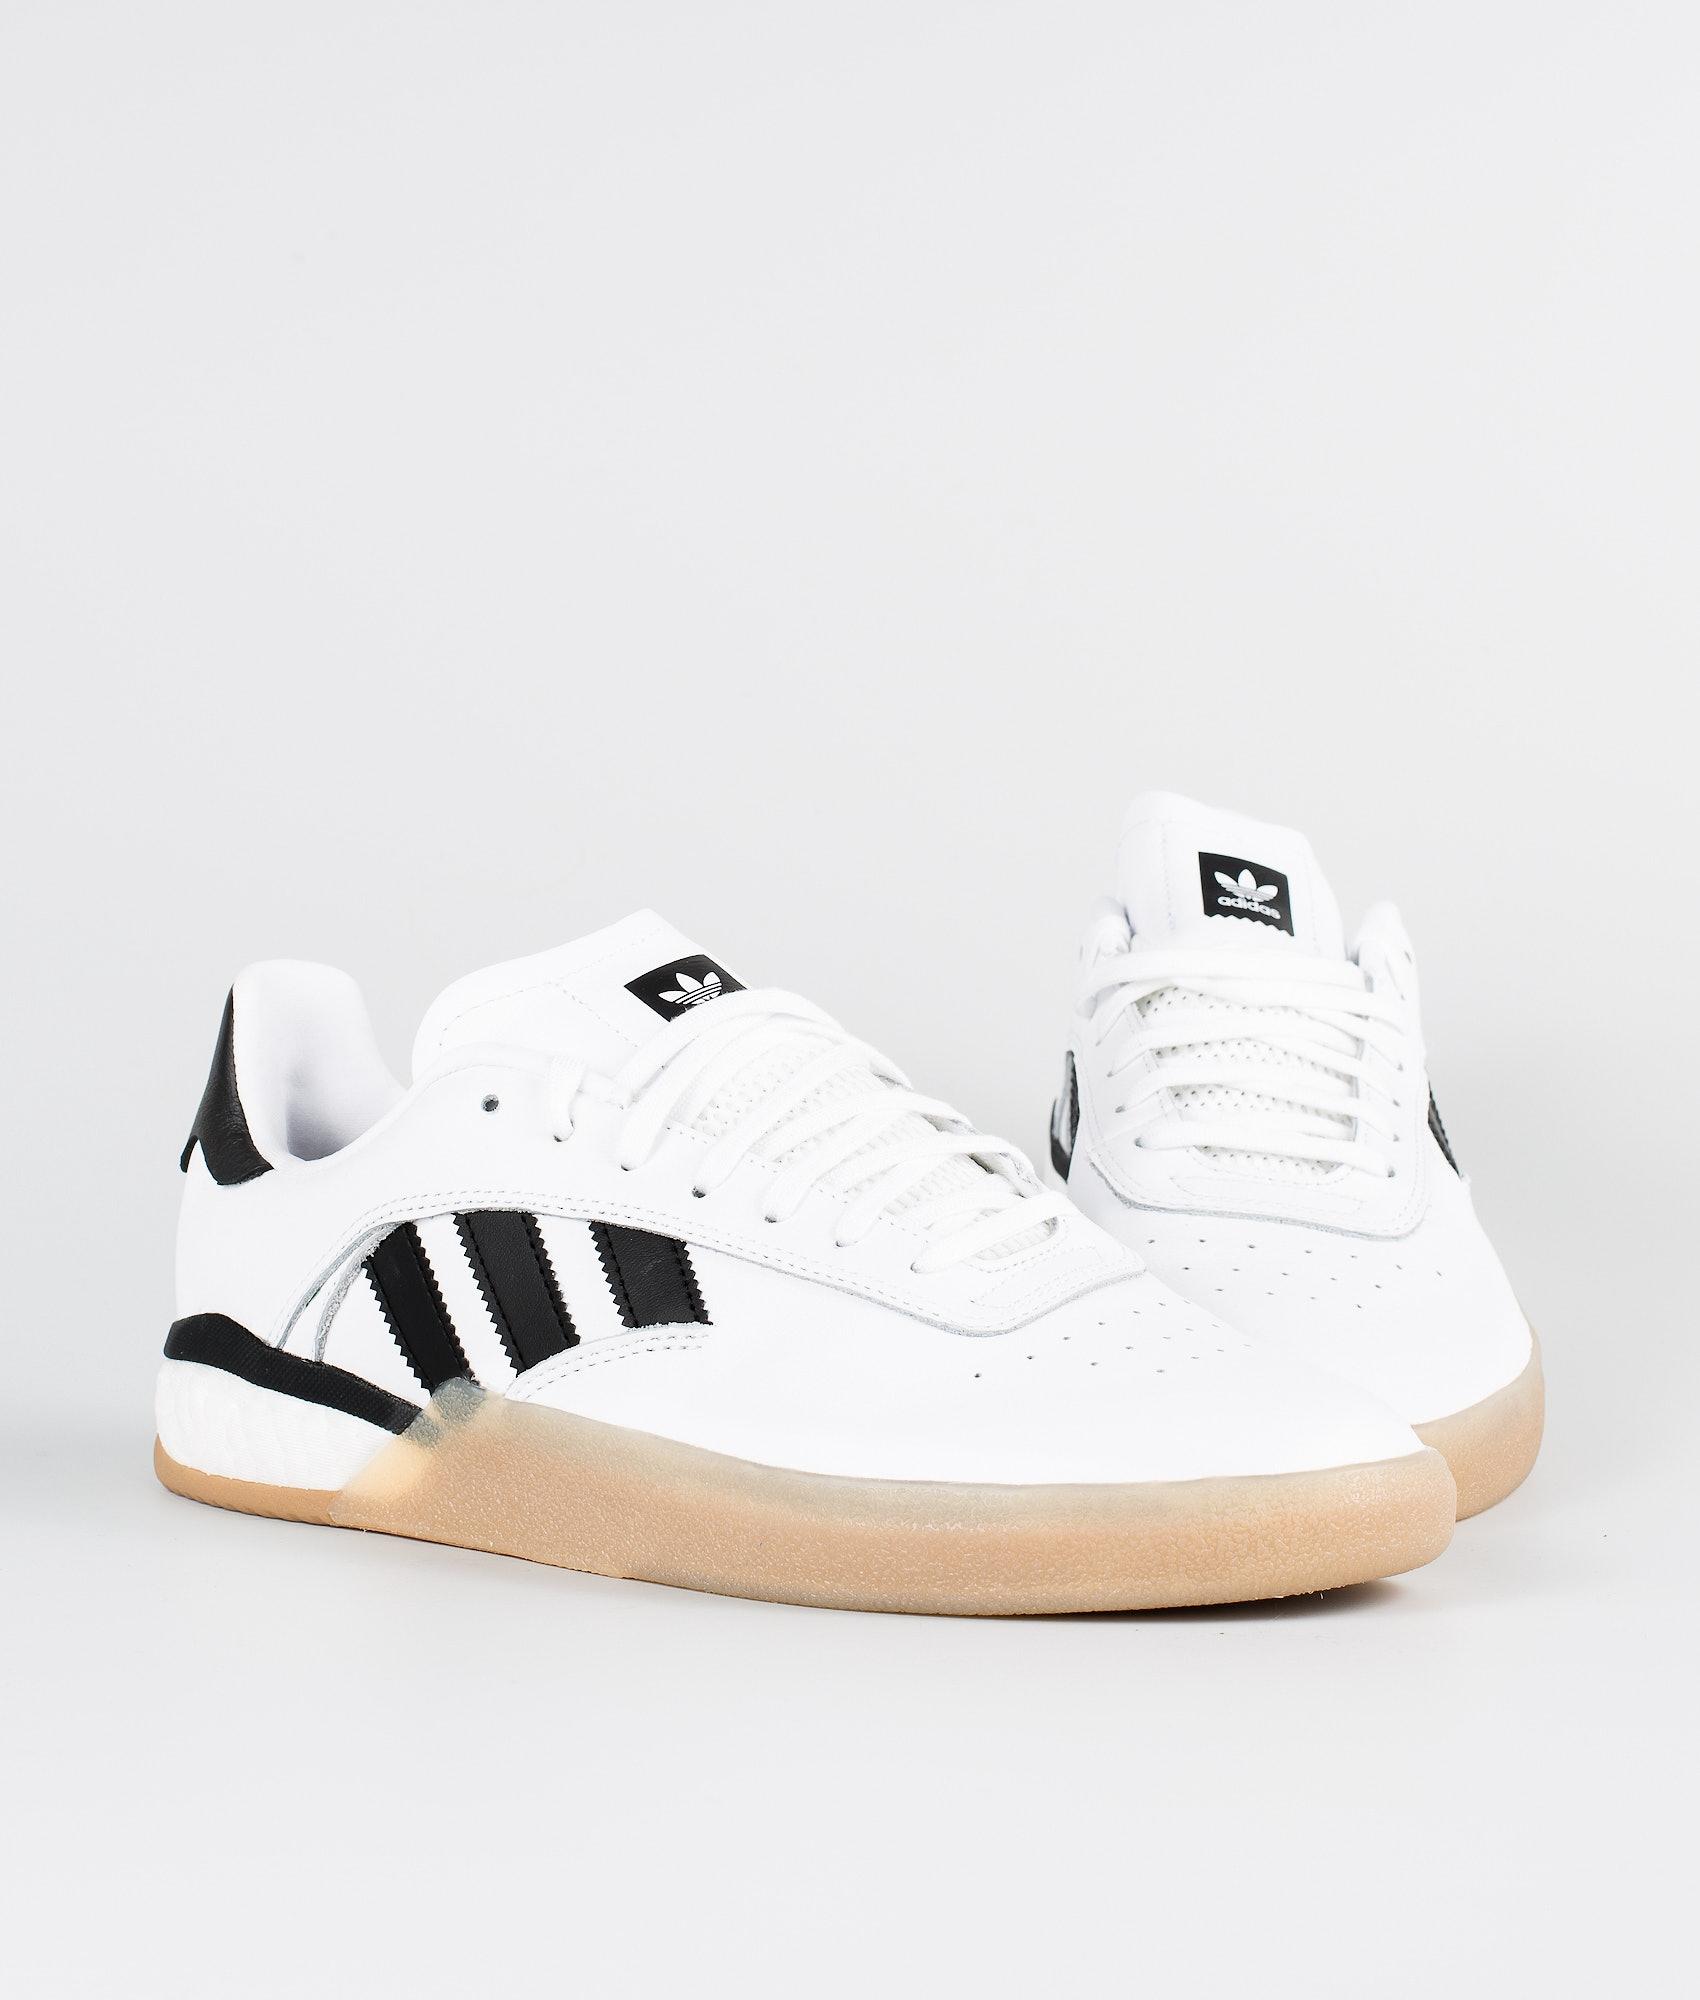 huge discount c6ab6 e89f8 Adidas Skateboarding 3St.004 Sko